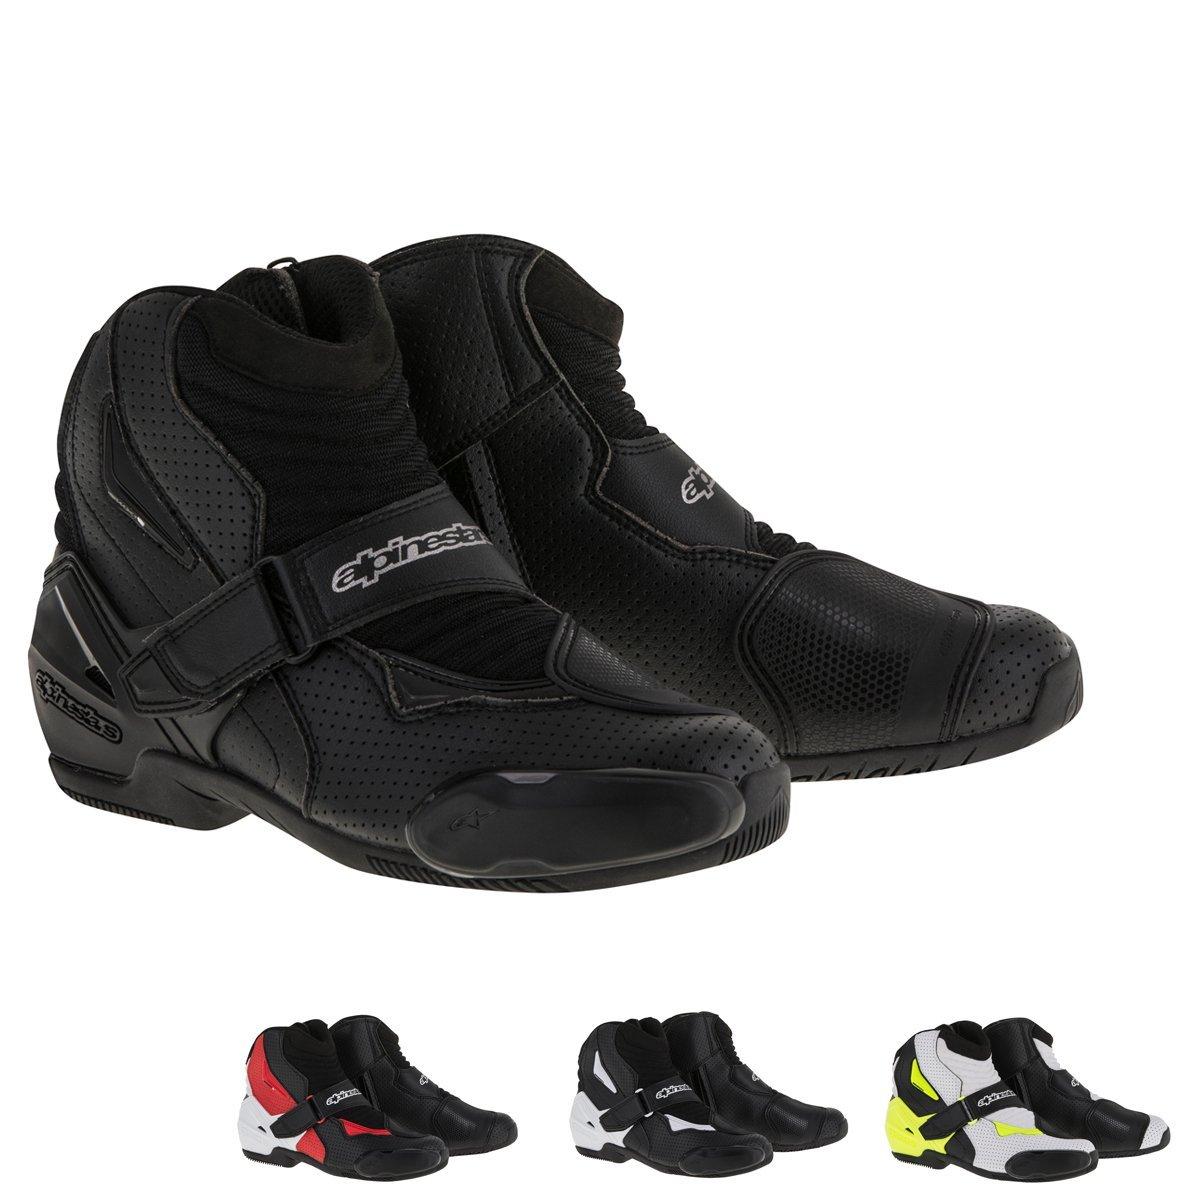 Alpinestars SMX-1R Vented Men's Street Motorcycle Shoes - Black / 39